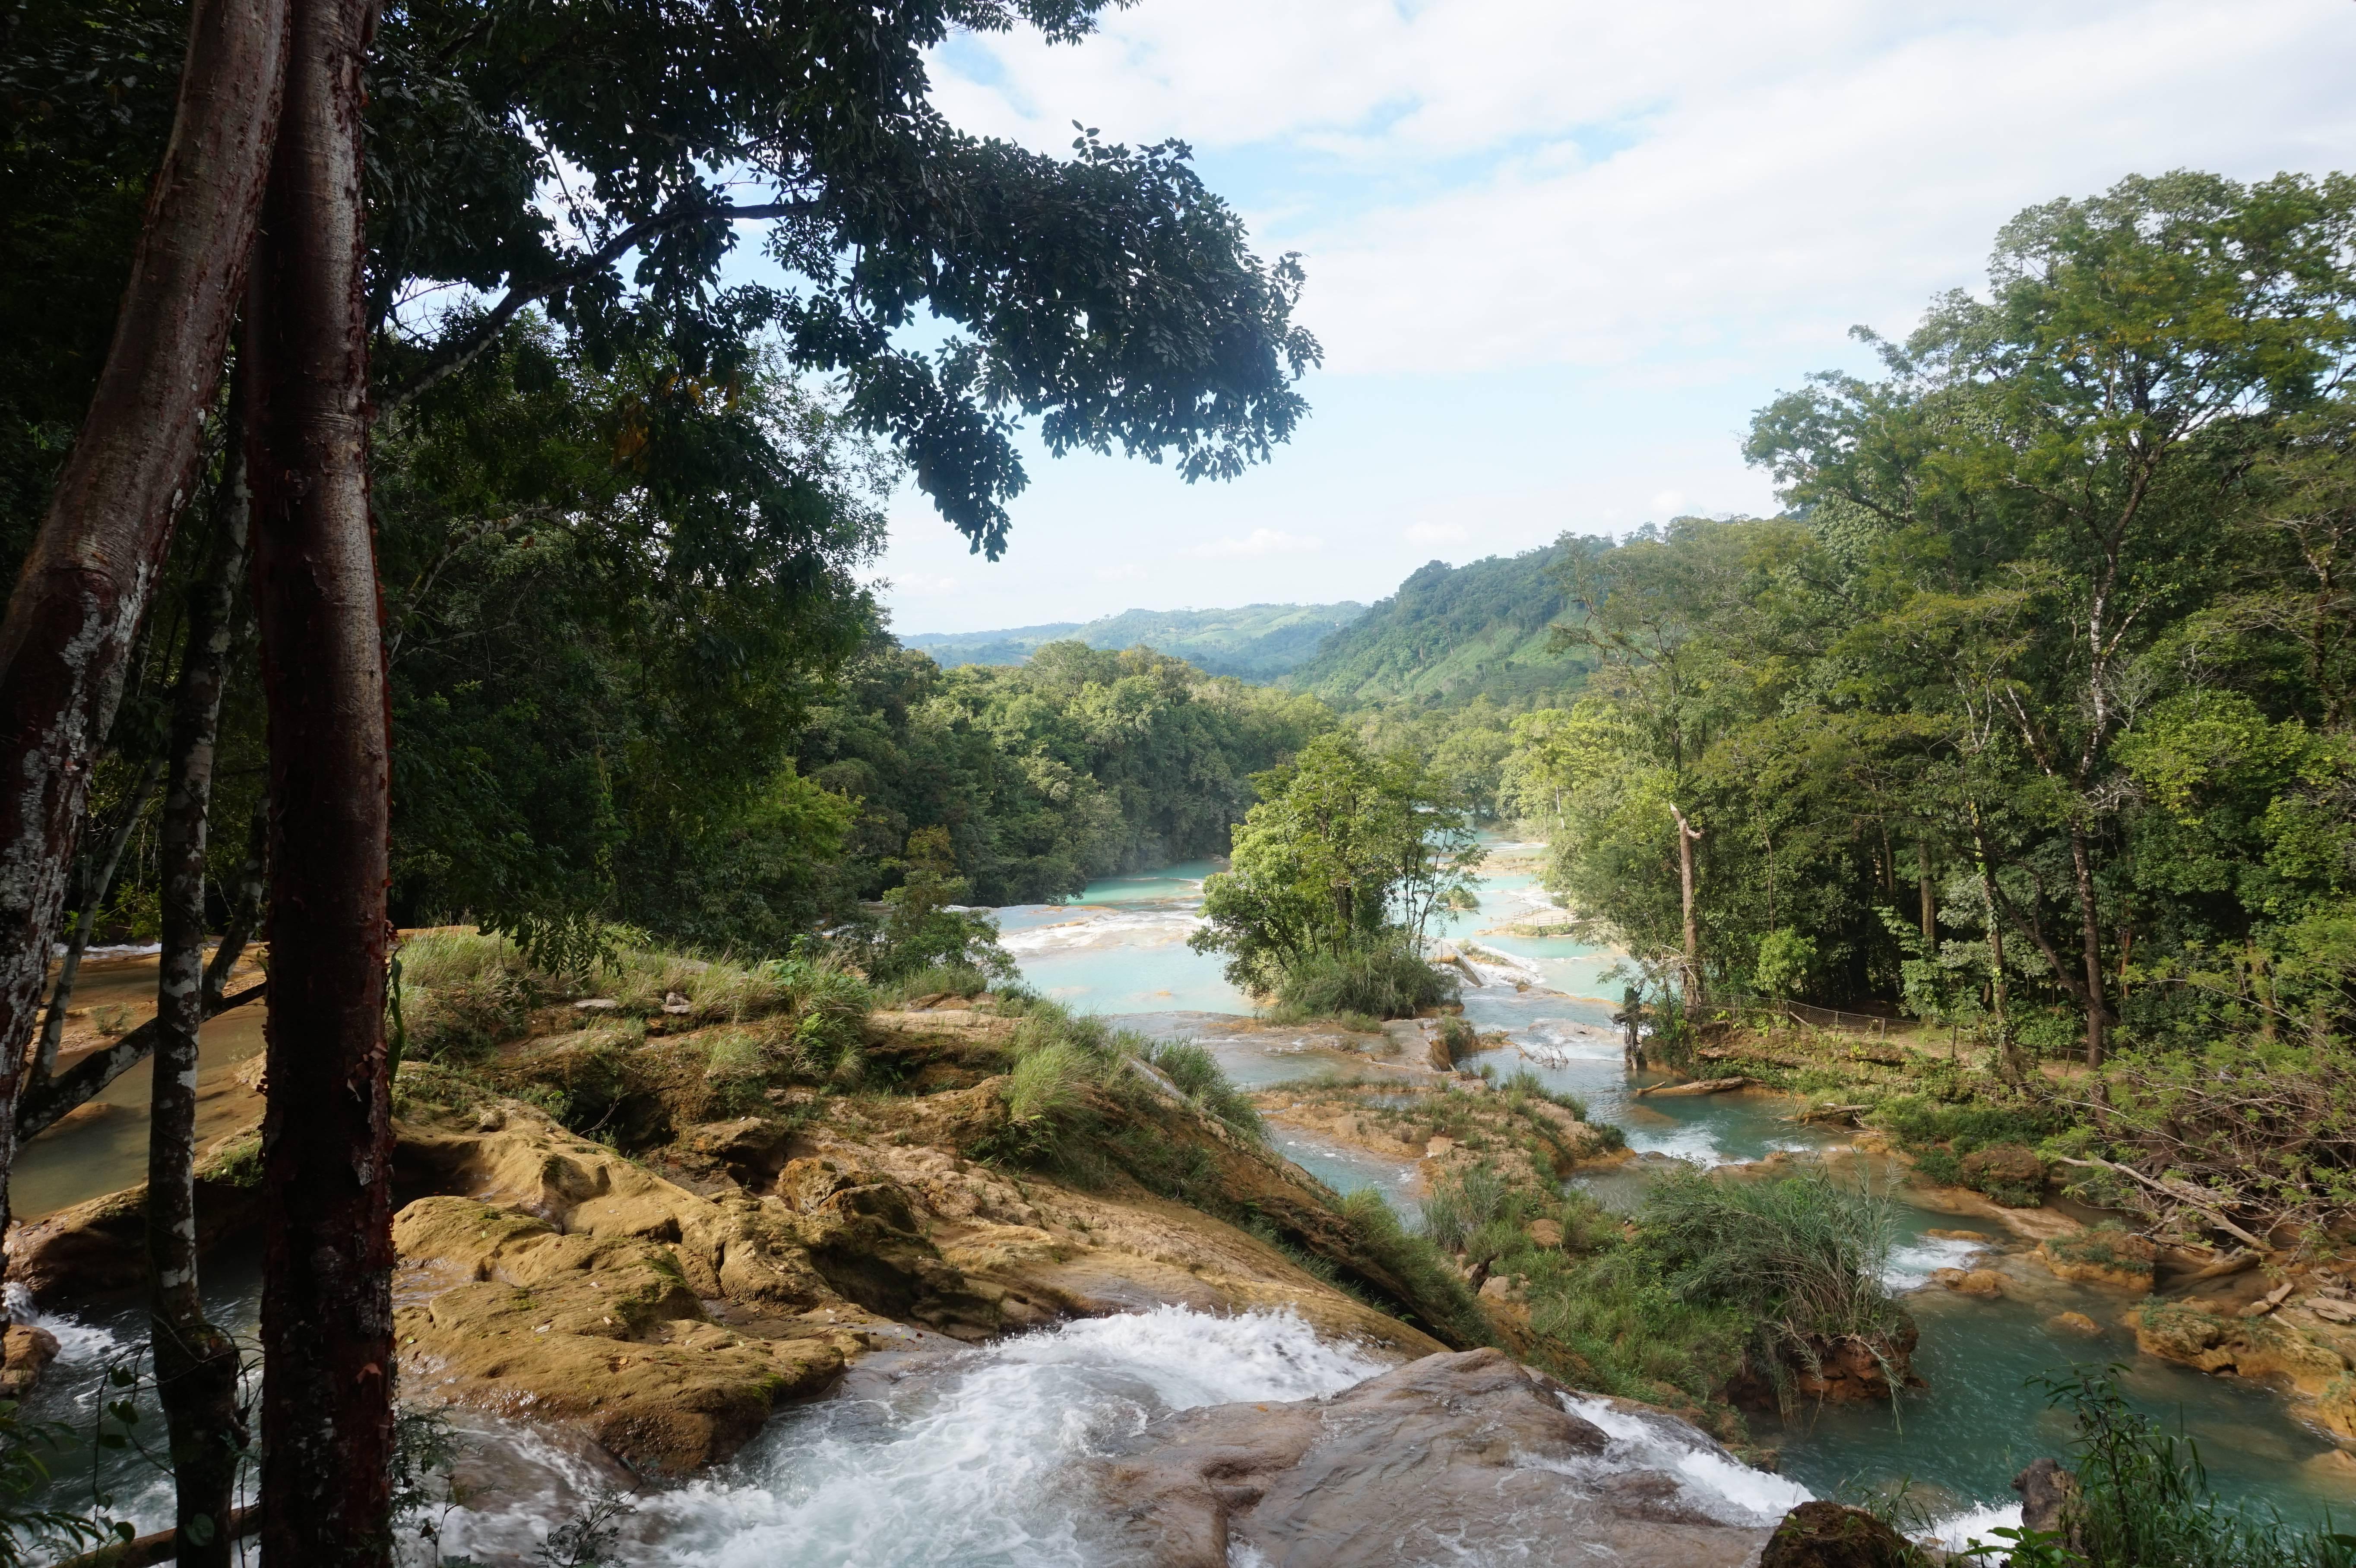 Photo 1: Agua Azul